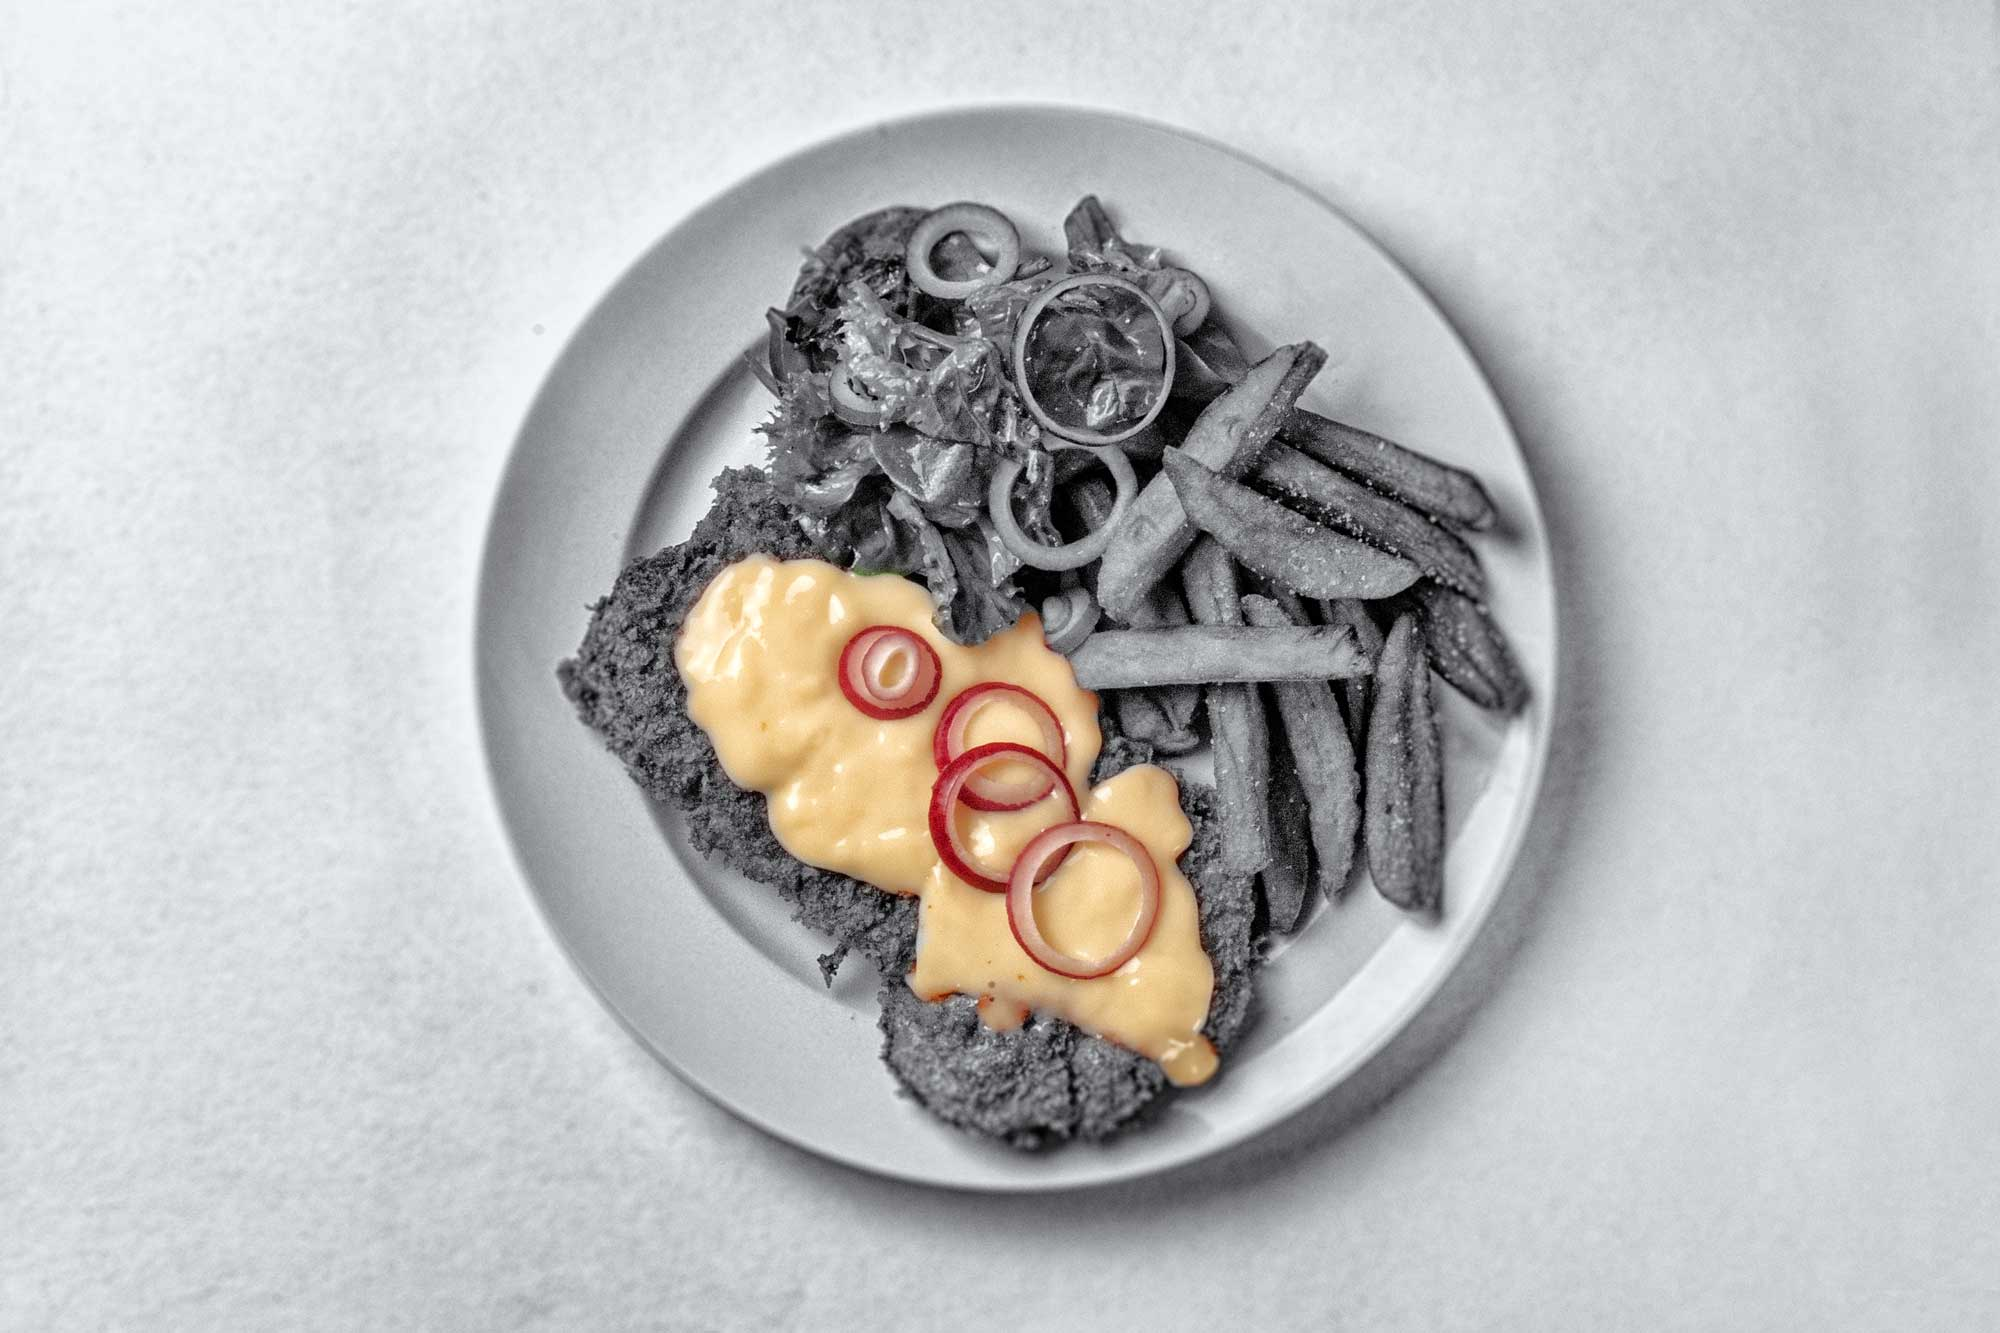 Das Odenwälder Kochkäseschnitzel oder Odenwälder Kochkäs' Schnitzel